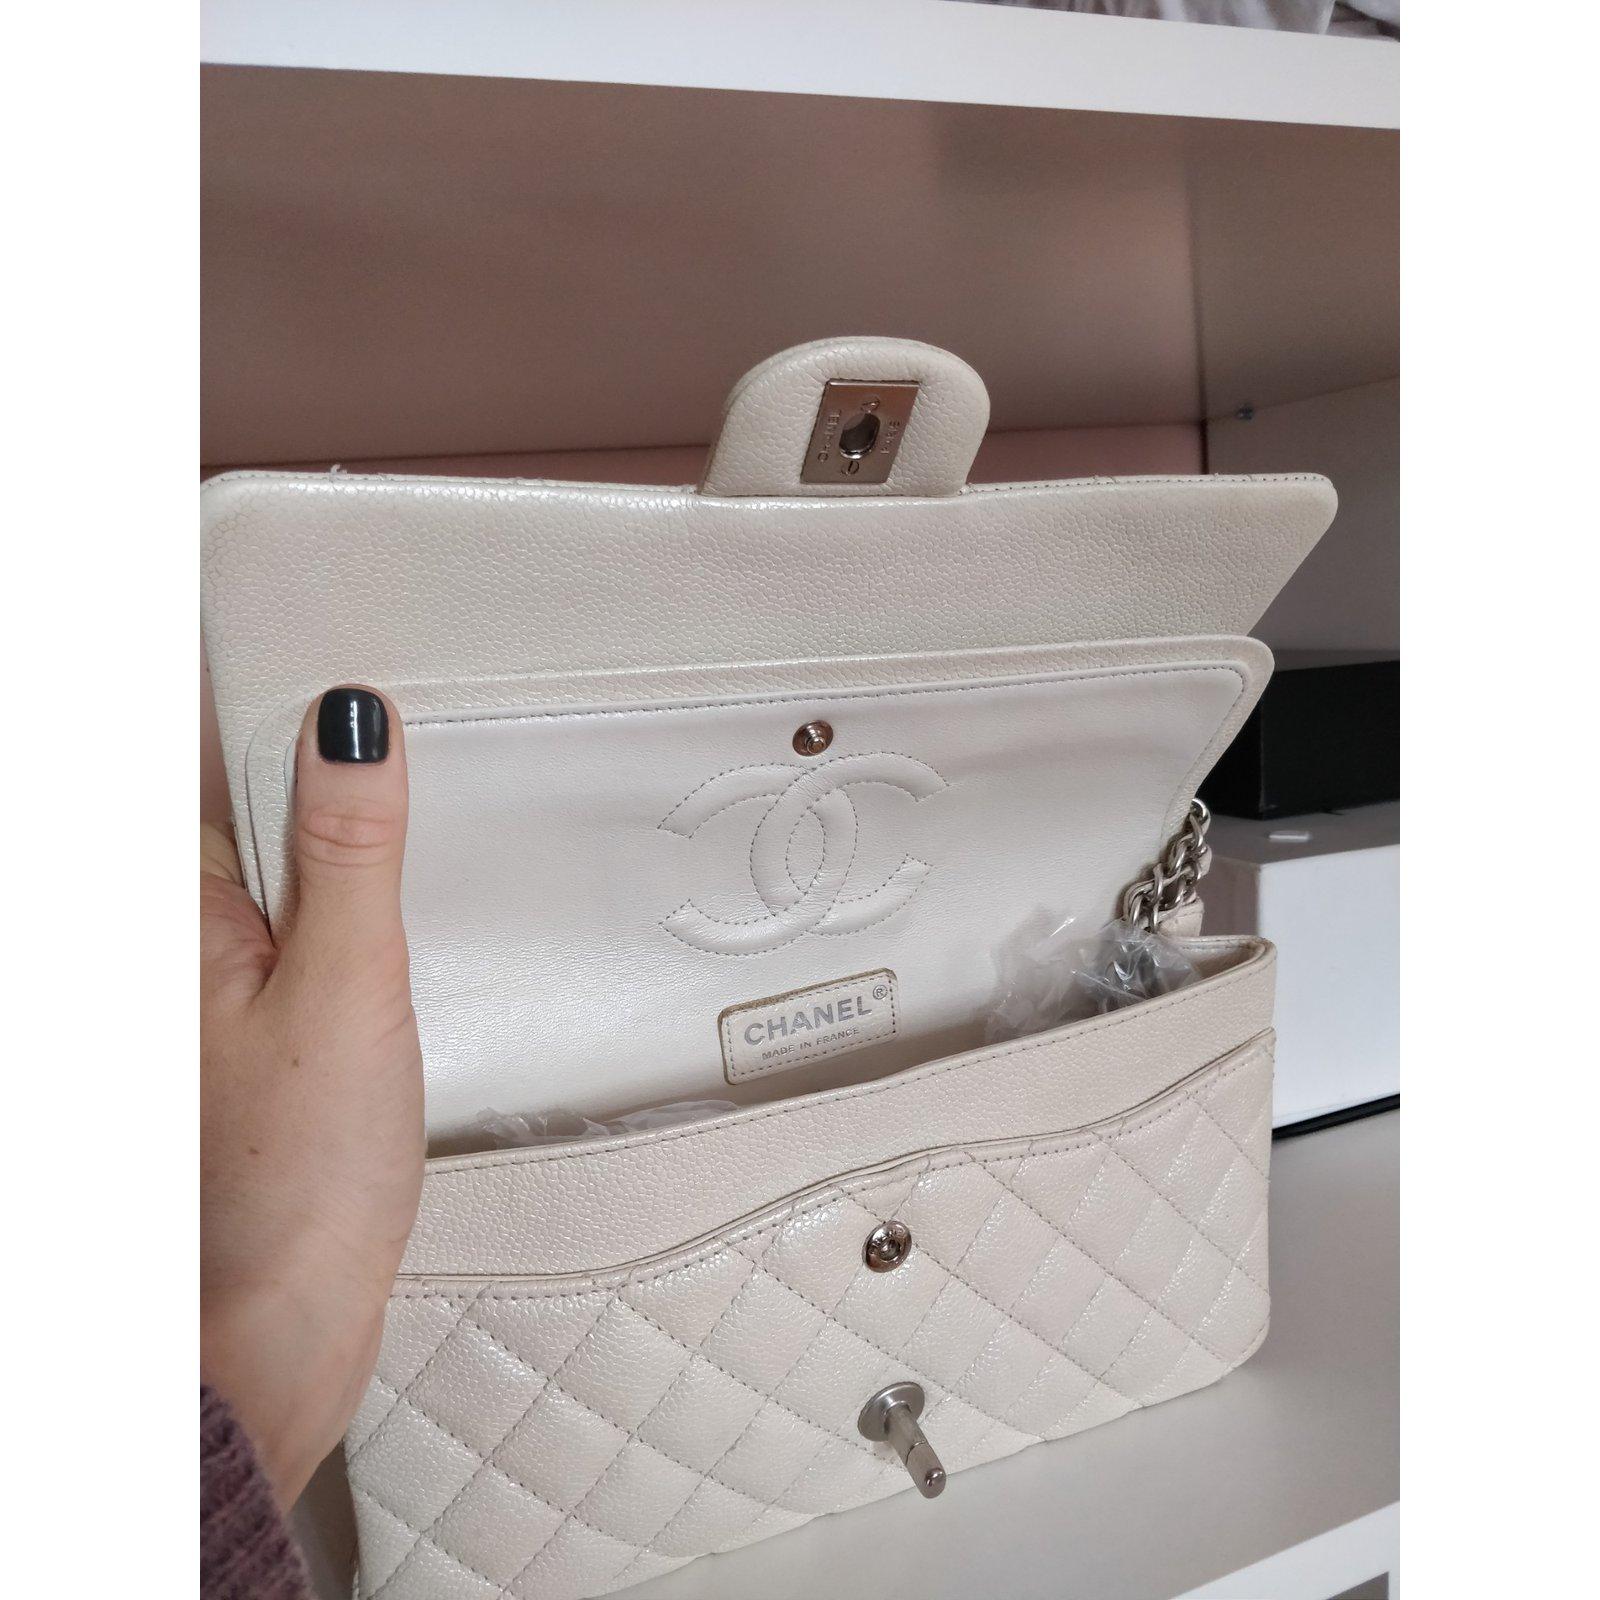 569eafe476d5 Chanel 2.55 timeless classic caviar Handbags Leather Cream ref.103802 -  Joli Closet